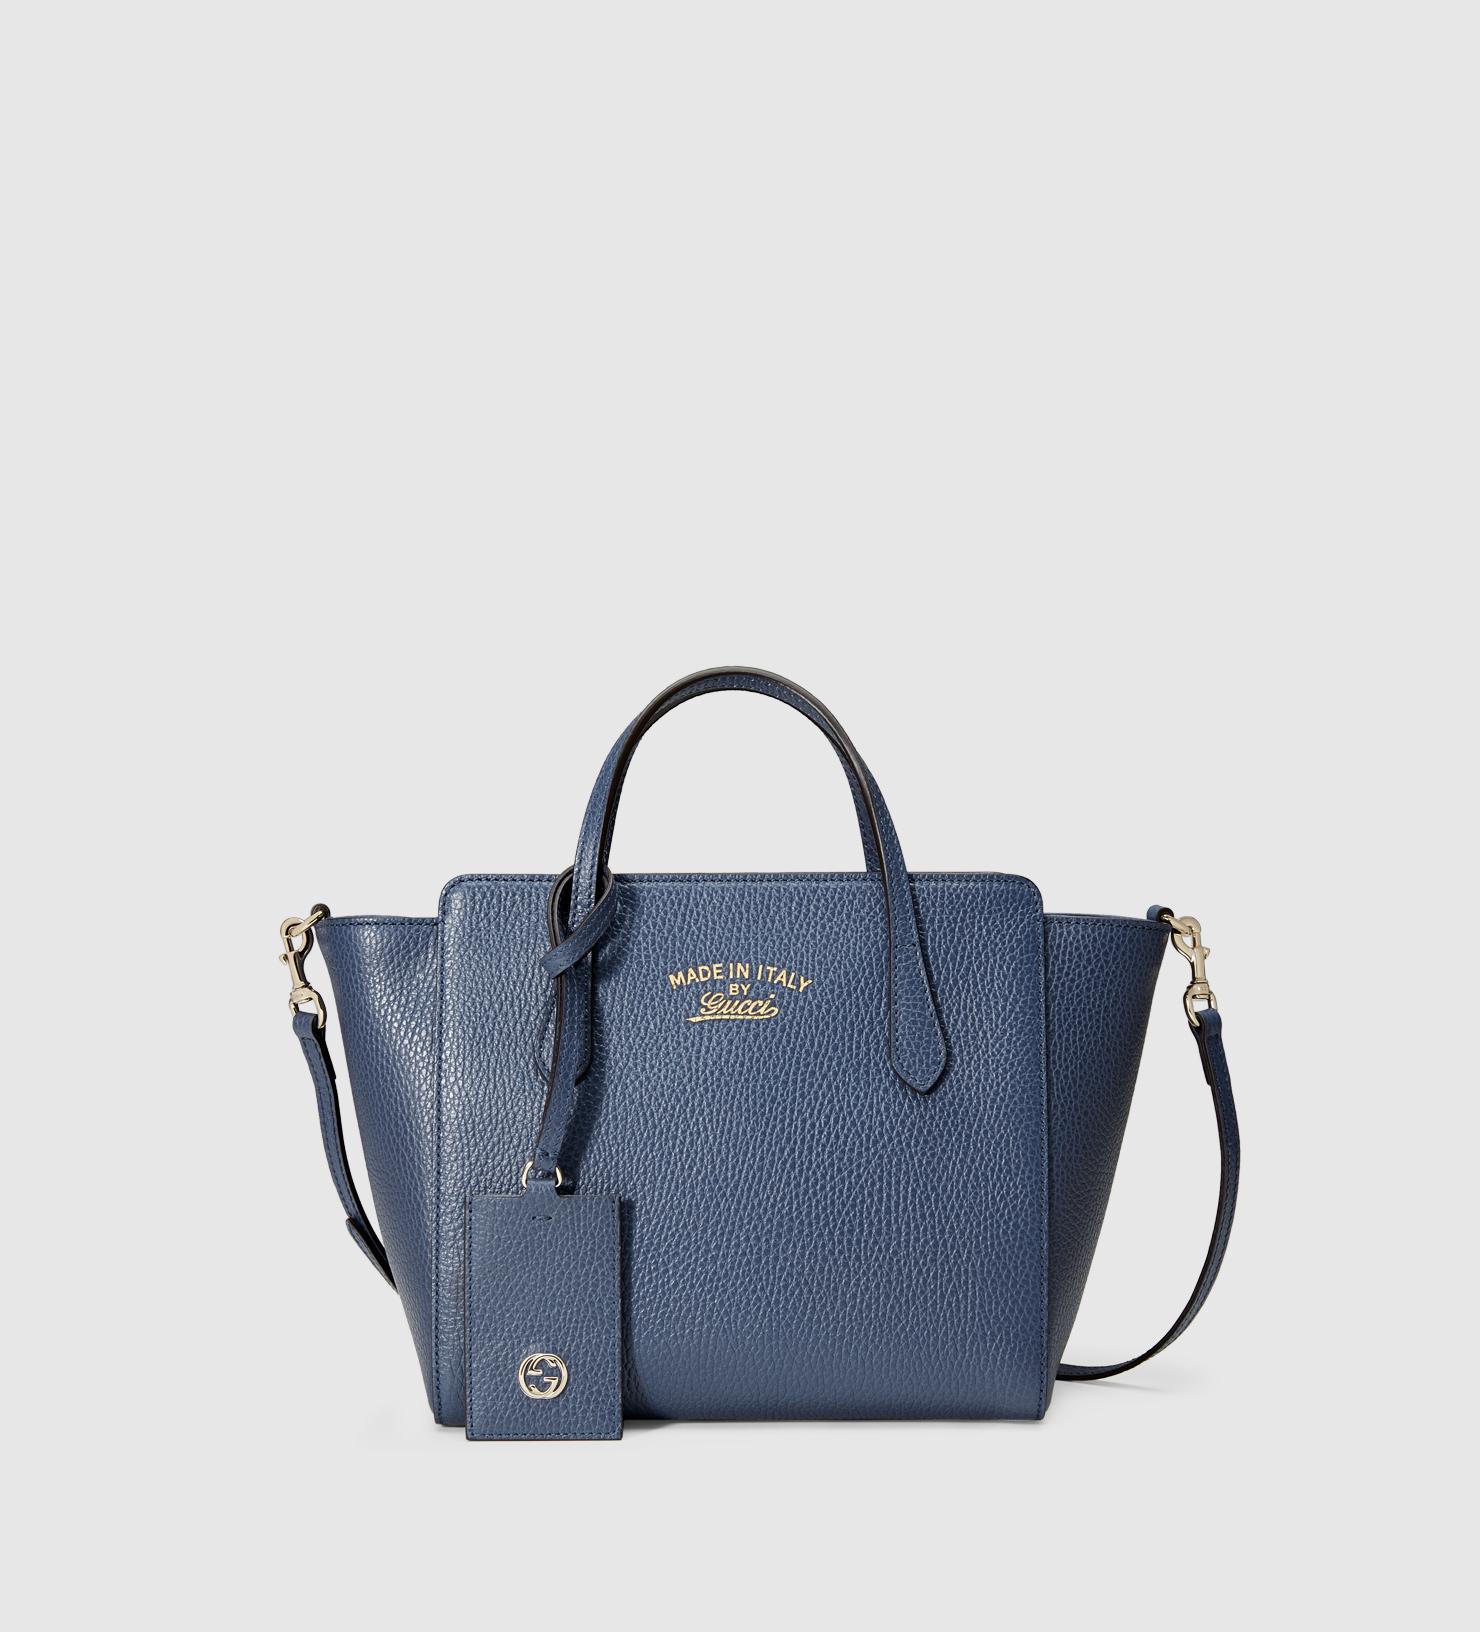 74cbf1c0e76499 Gucci Swing Mini Leather Top Handle Bag in Blue - Lyst